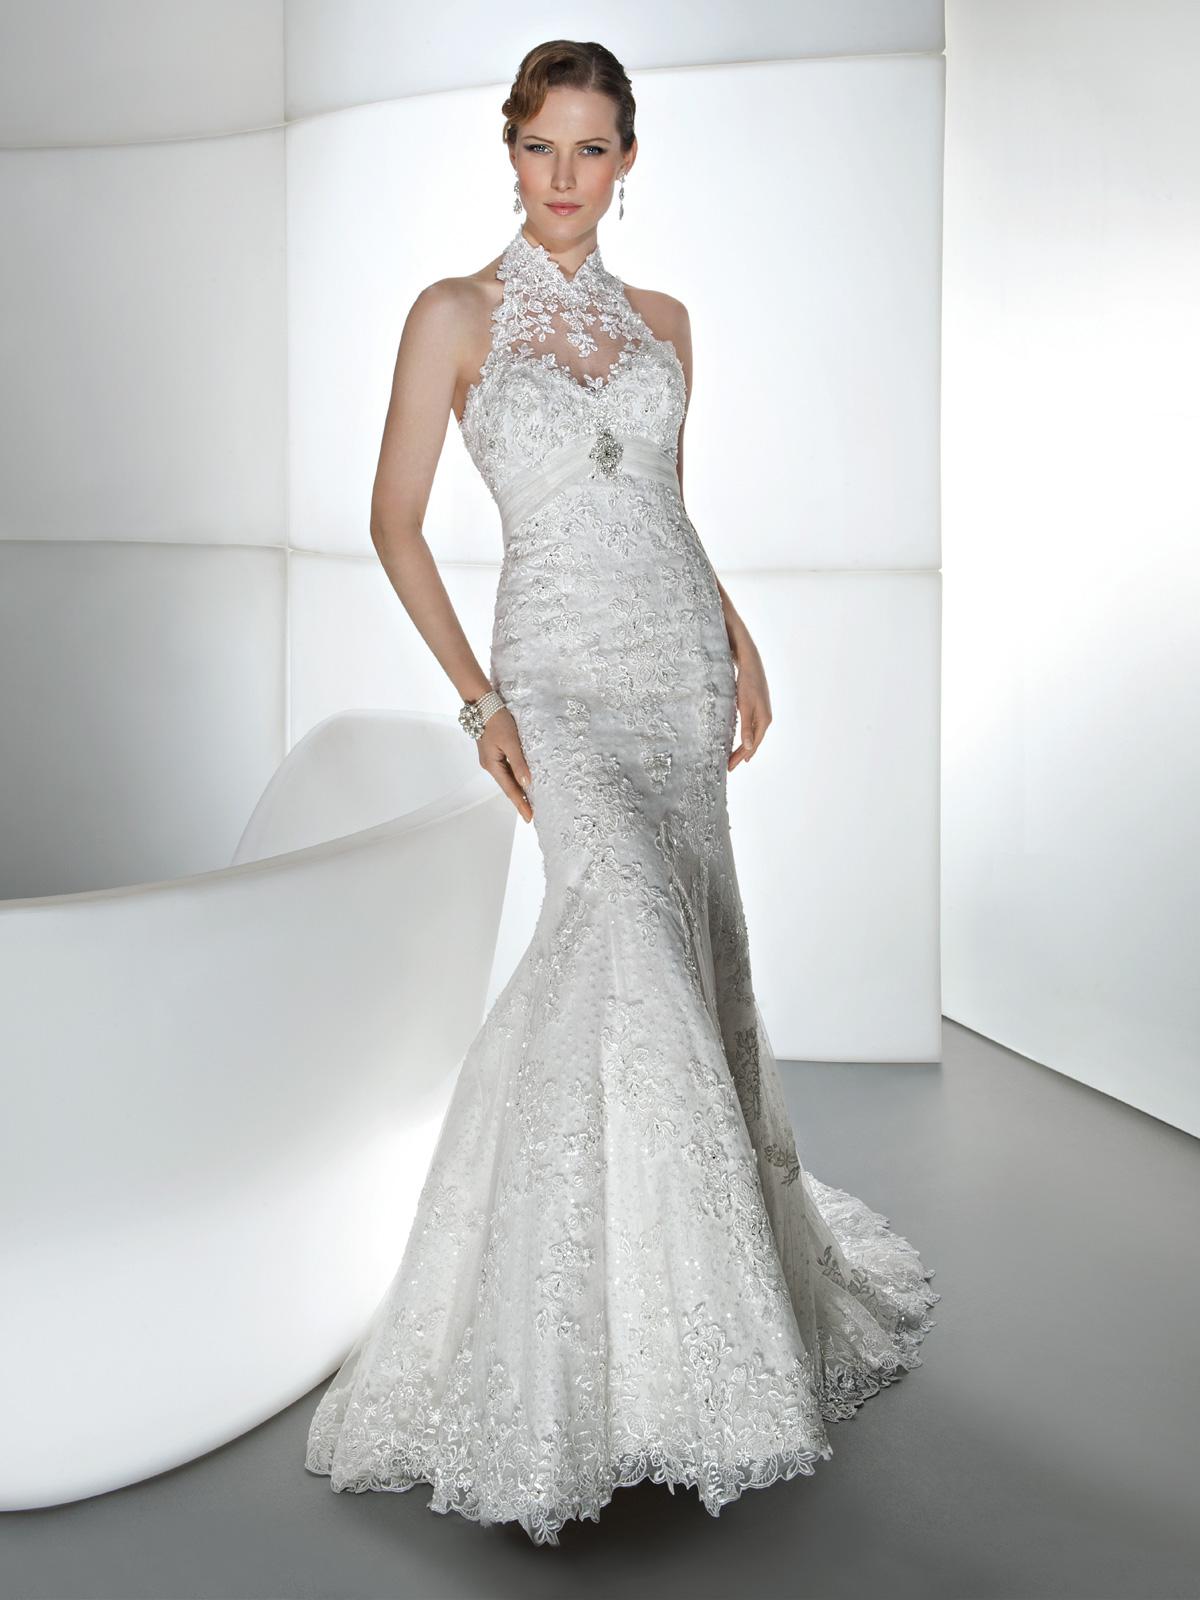 Vestido de Noiva cava americana, em renda rebordada, corte sereia e broche de metal no decote, leve cauda.